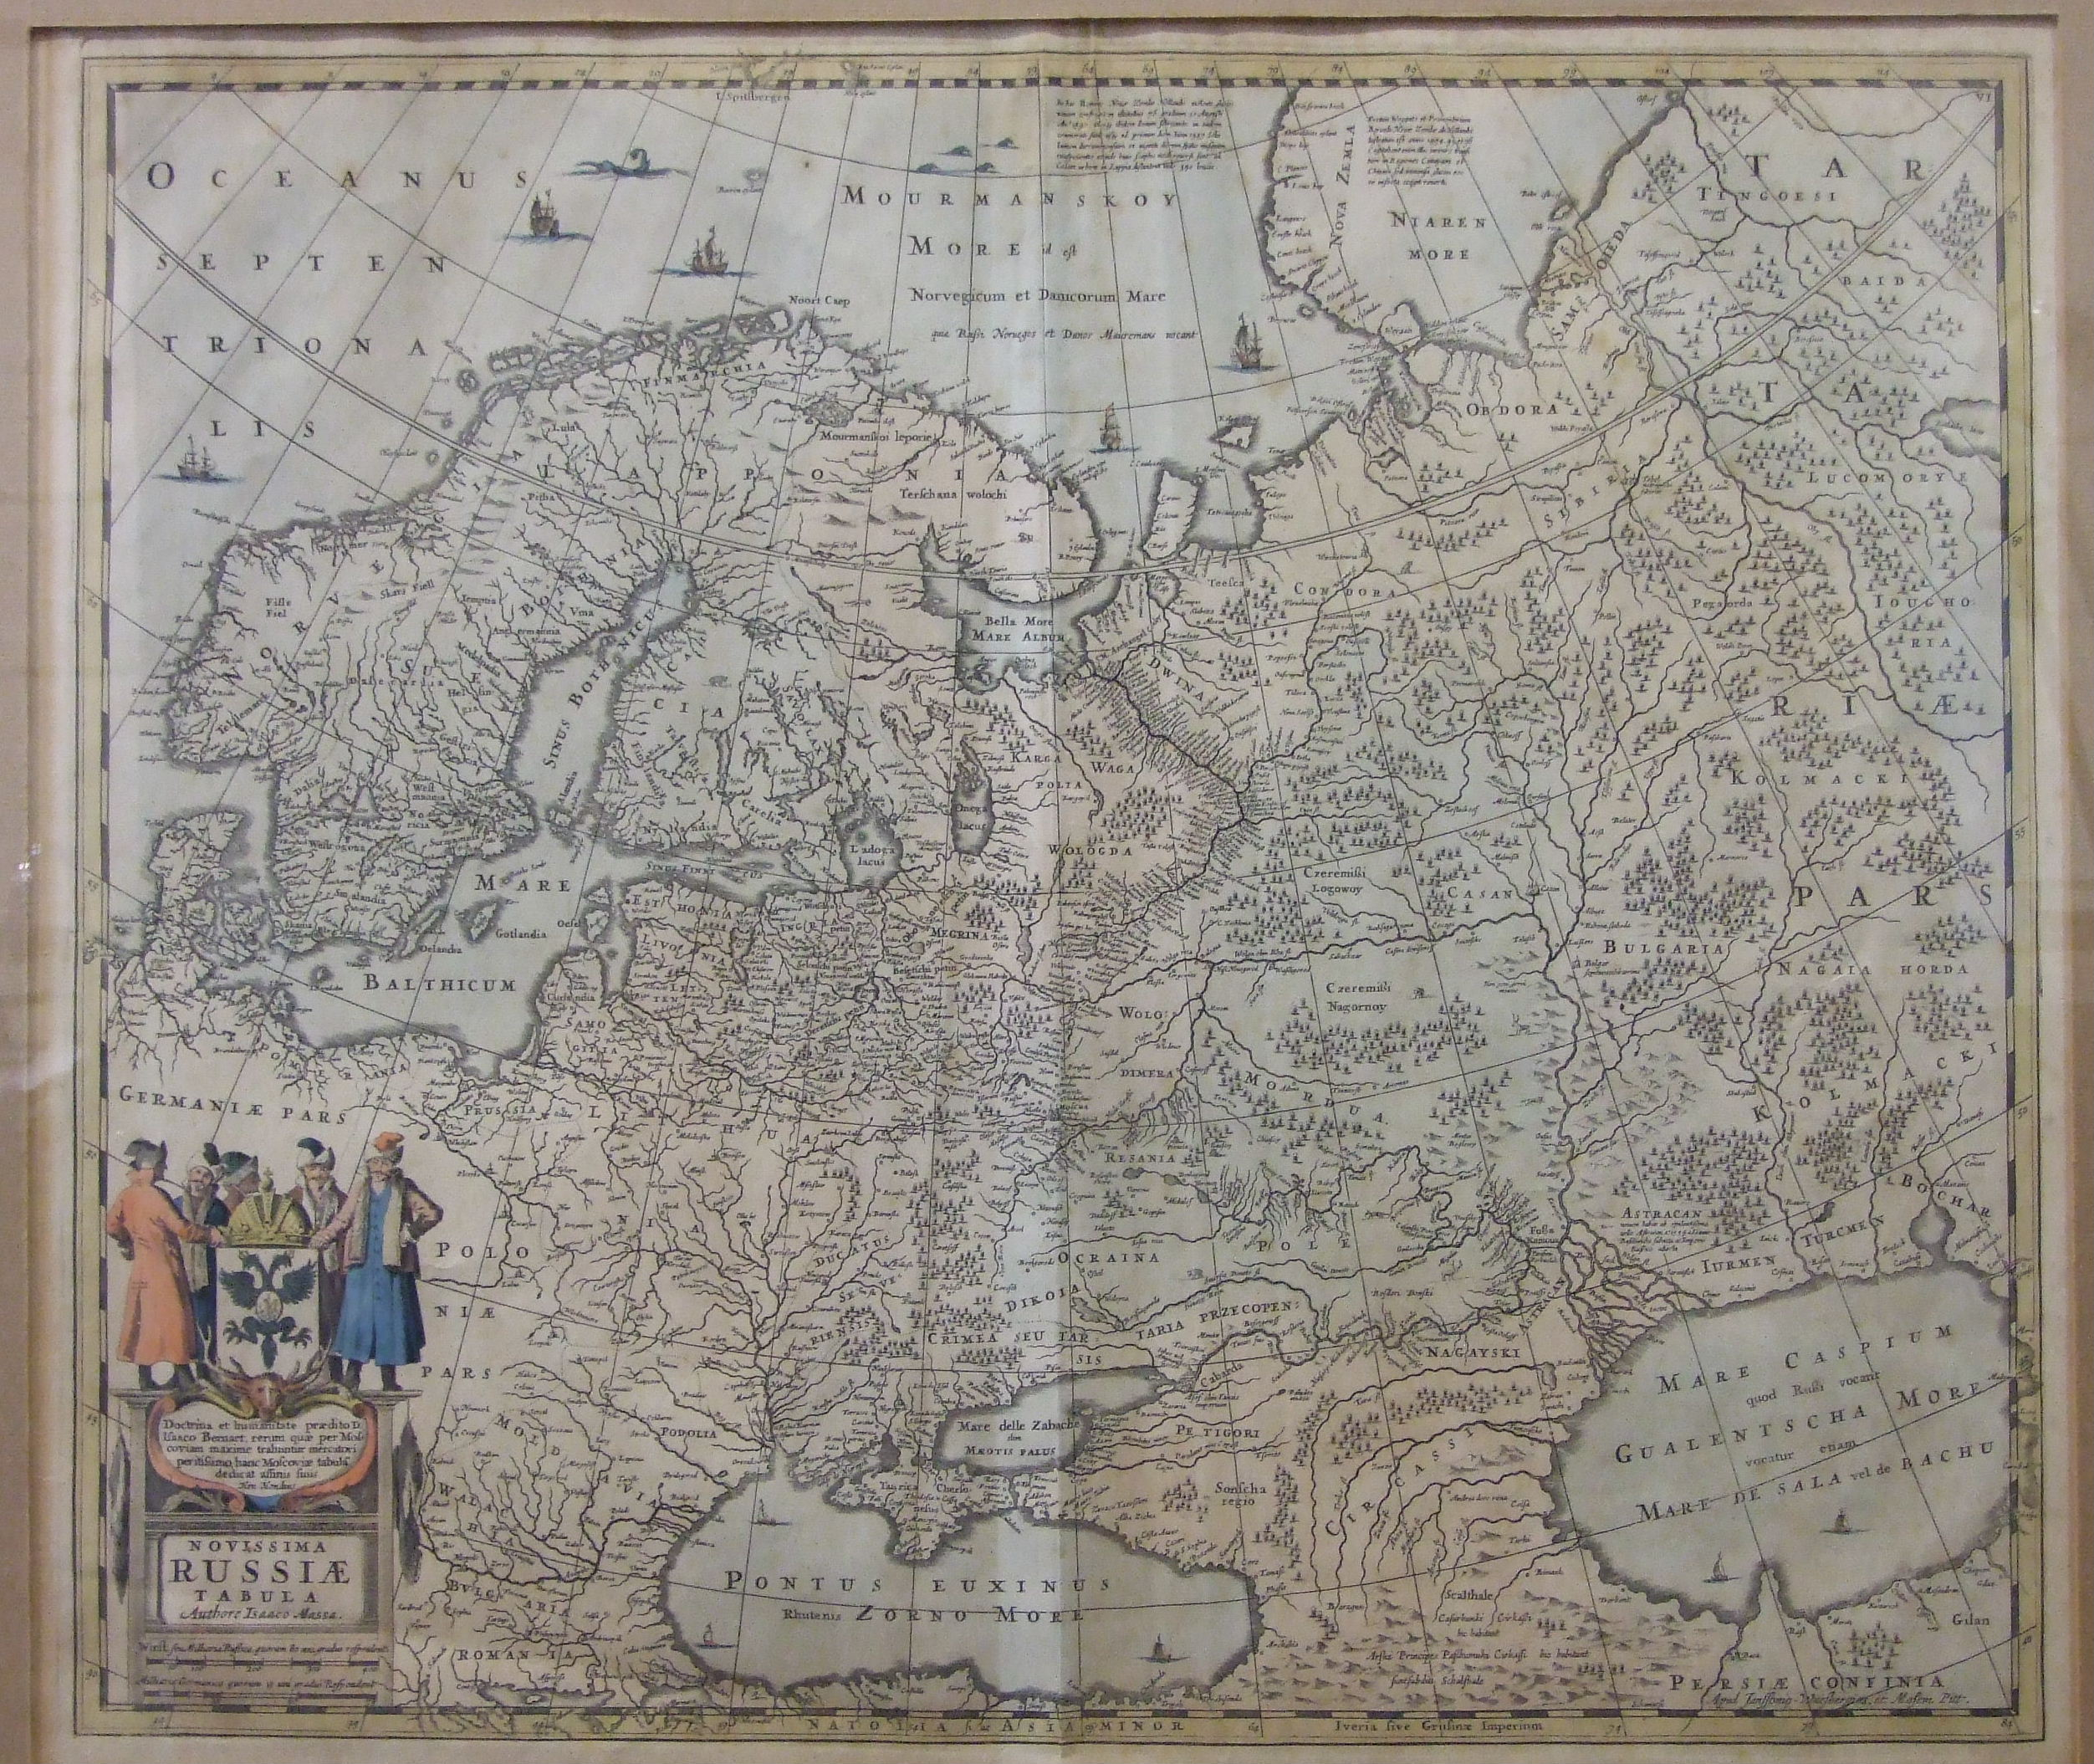 Lot 53 - Isaaco Massa, 'Novissima Russiae Tabula', hand-coloured map, 49 x 57cm, some foxing overall.